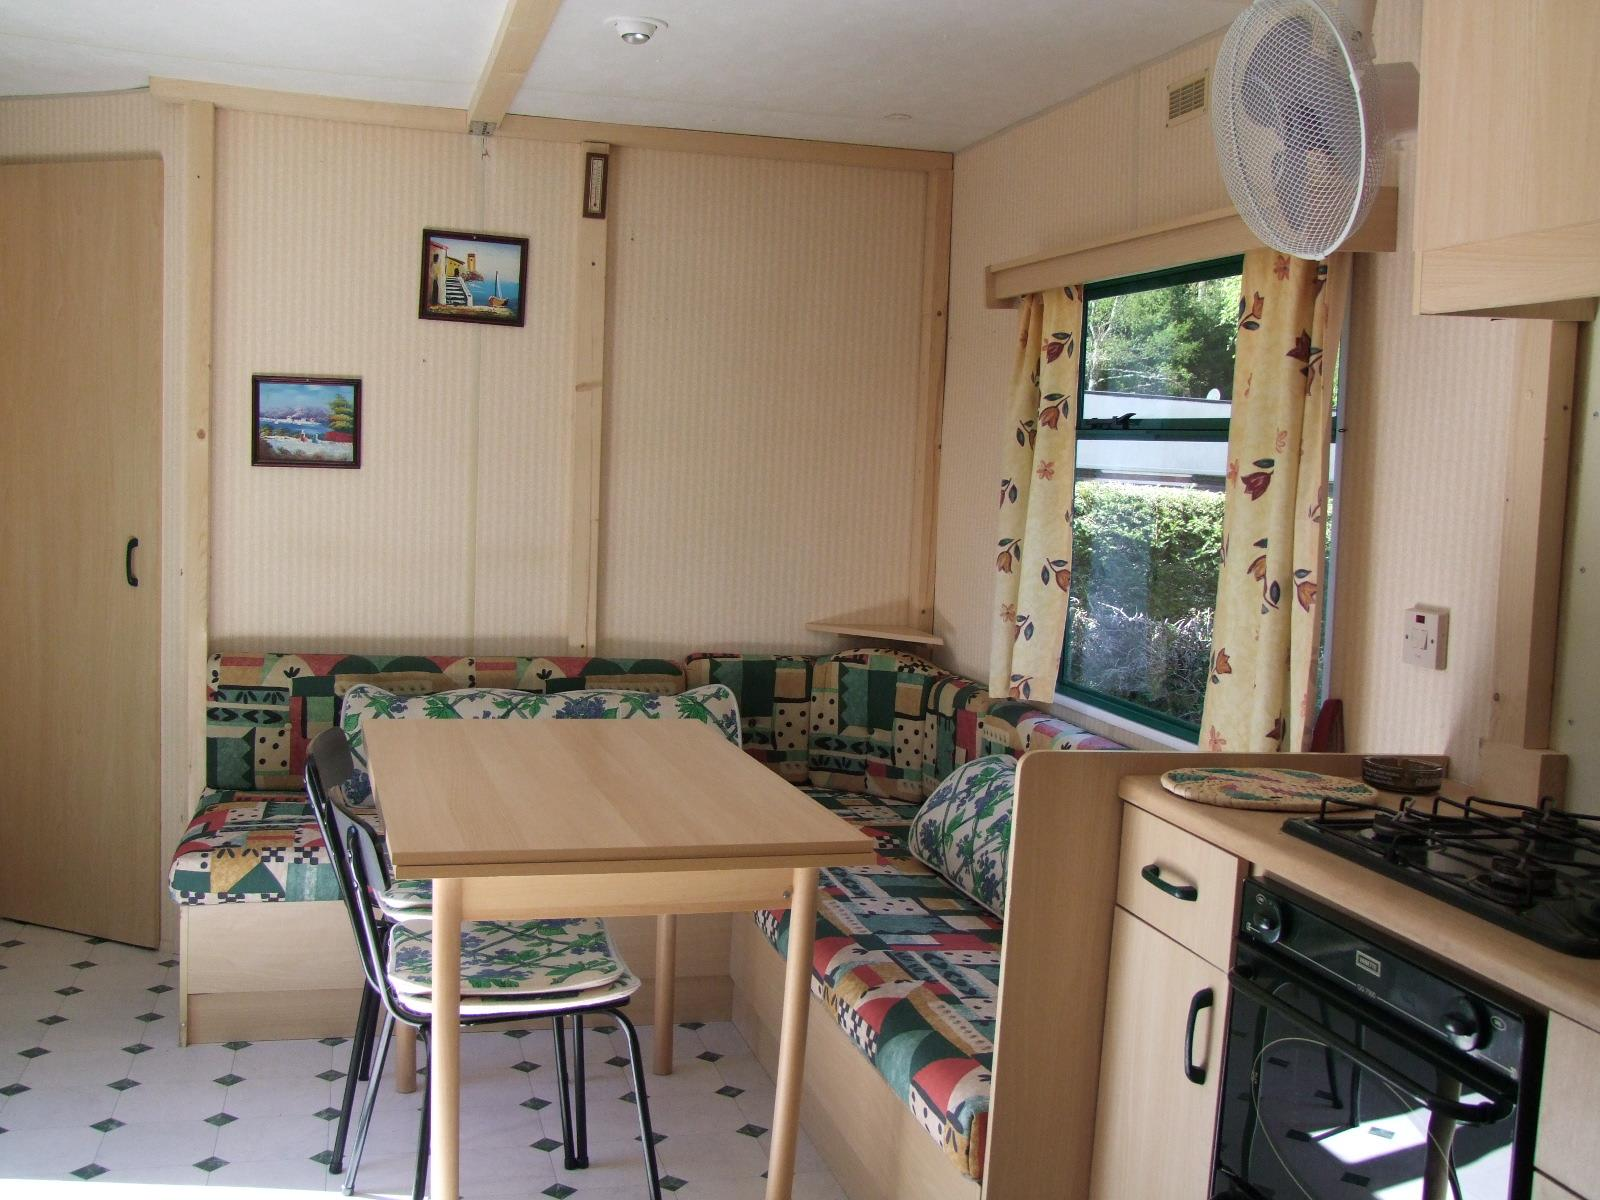 Location - Eco-Caravane 25M² (2 Chambres) + Terrasse - Sans Sanitaires - 1999 - Flower Camping Verte Vallee